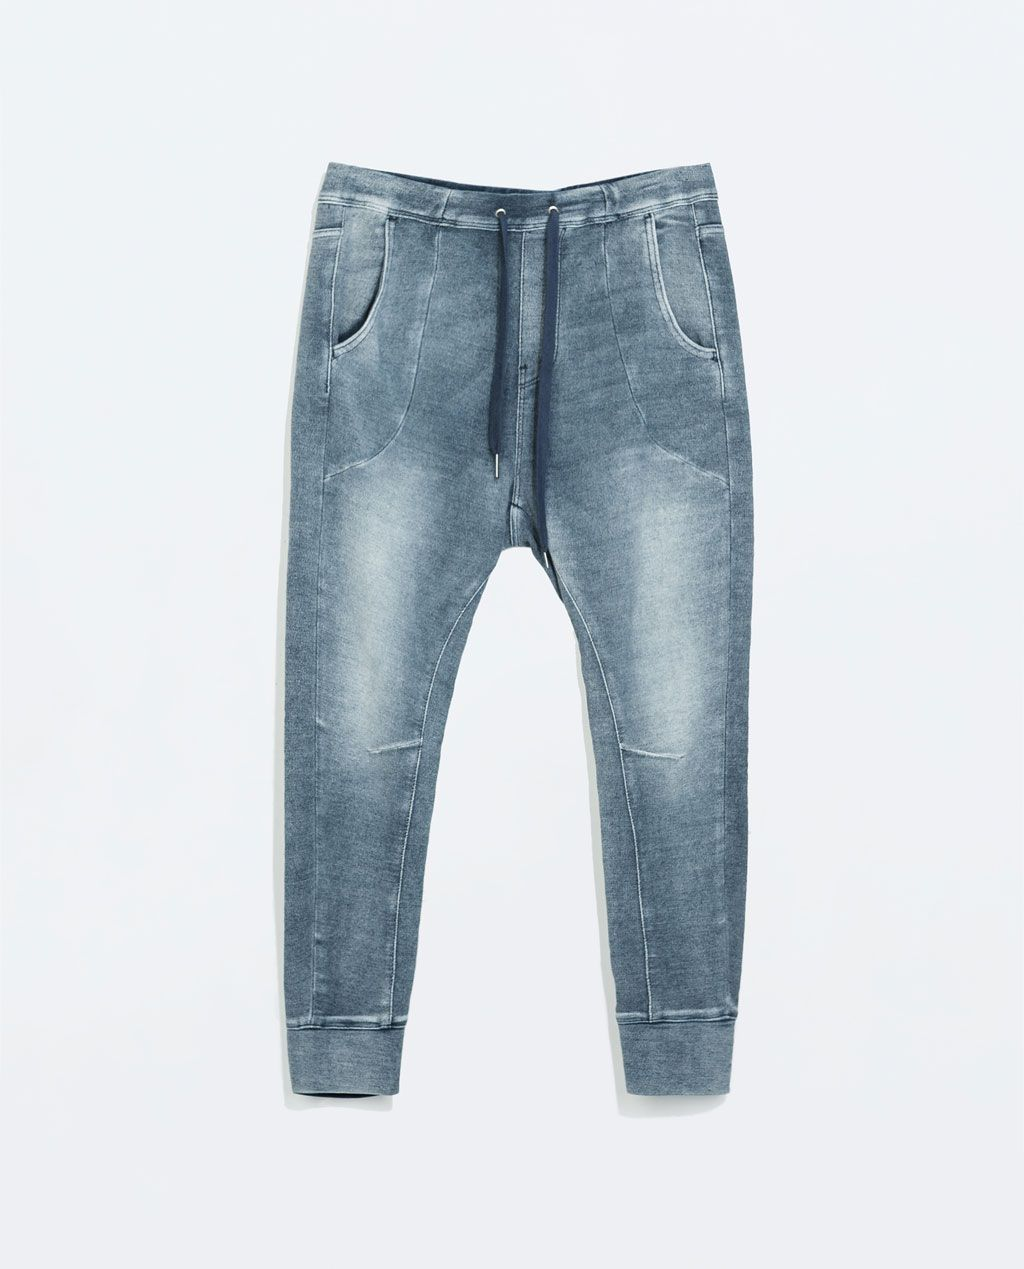 7fbe9bd6 Zara - Terrycloth Jogging Pants | Men's Fashion | Pants, Denim, Jogging